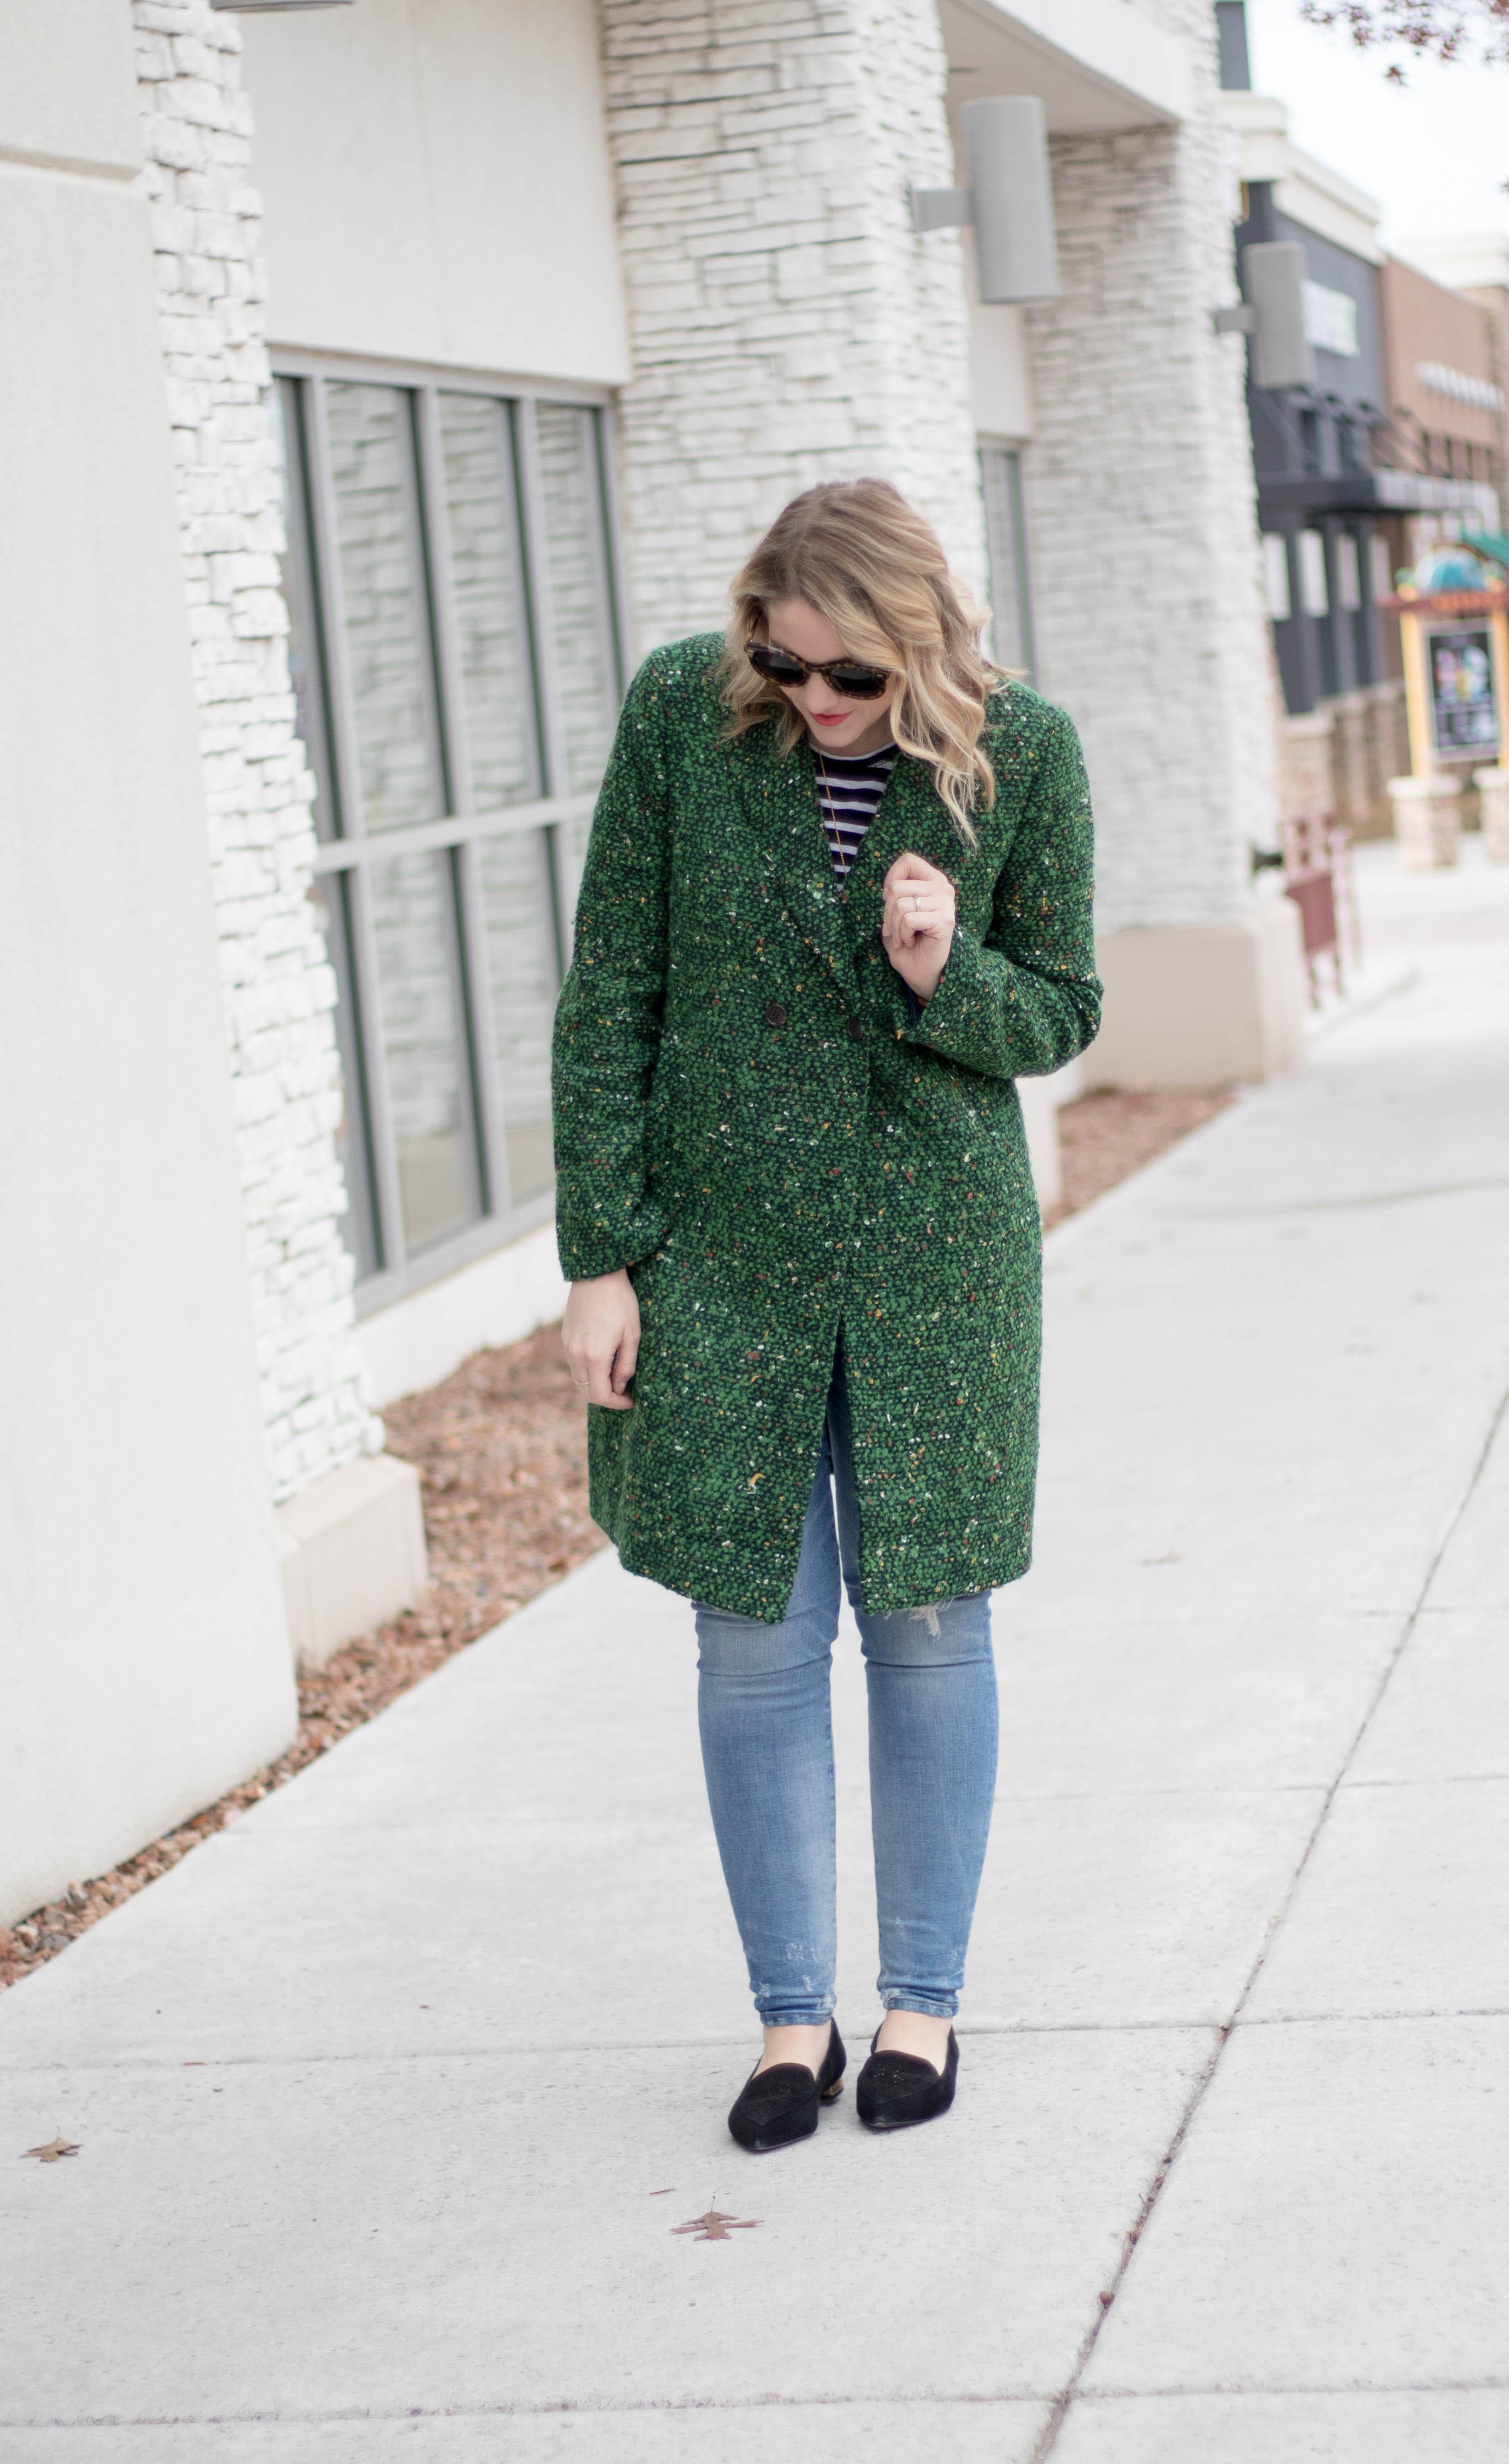 how to style a tweed coat #tweed #everydaymadewell #jcrew